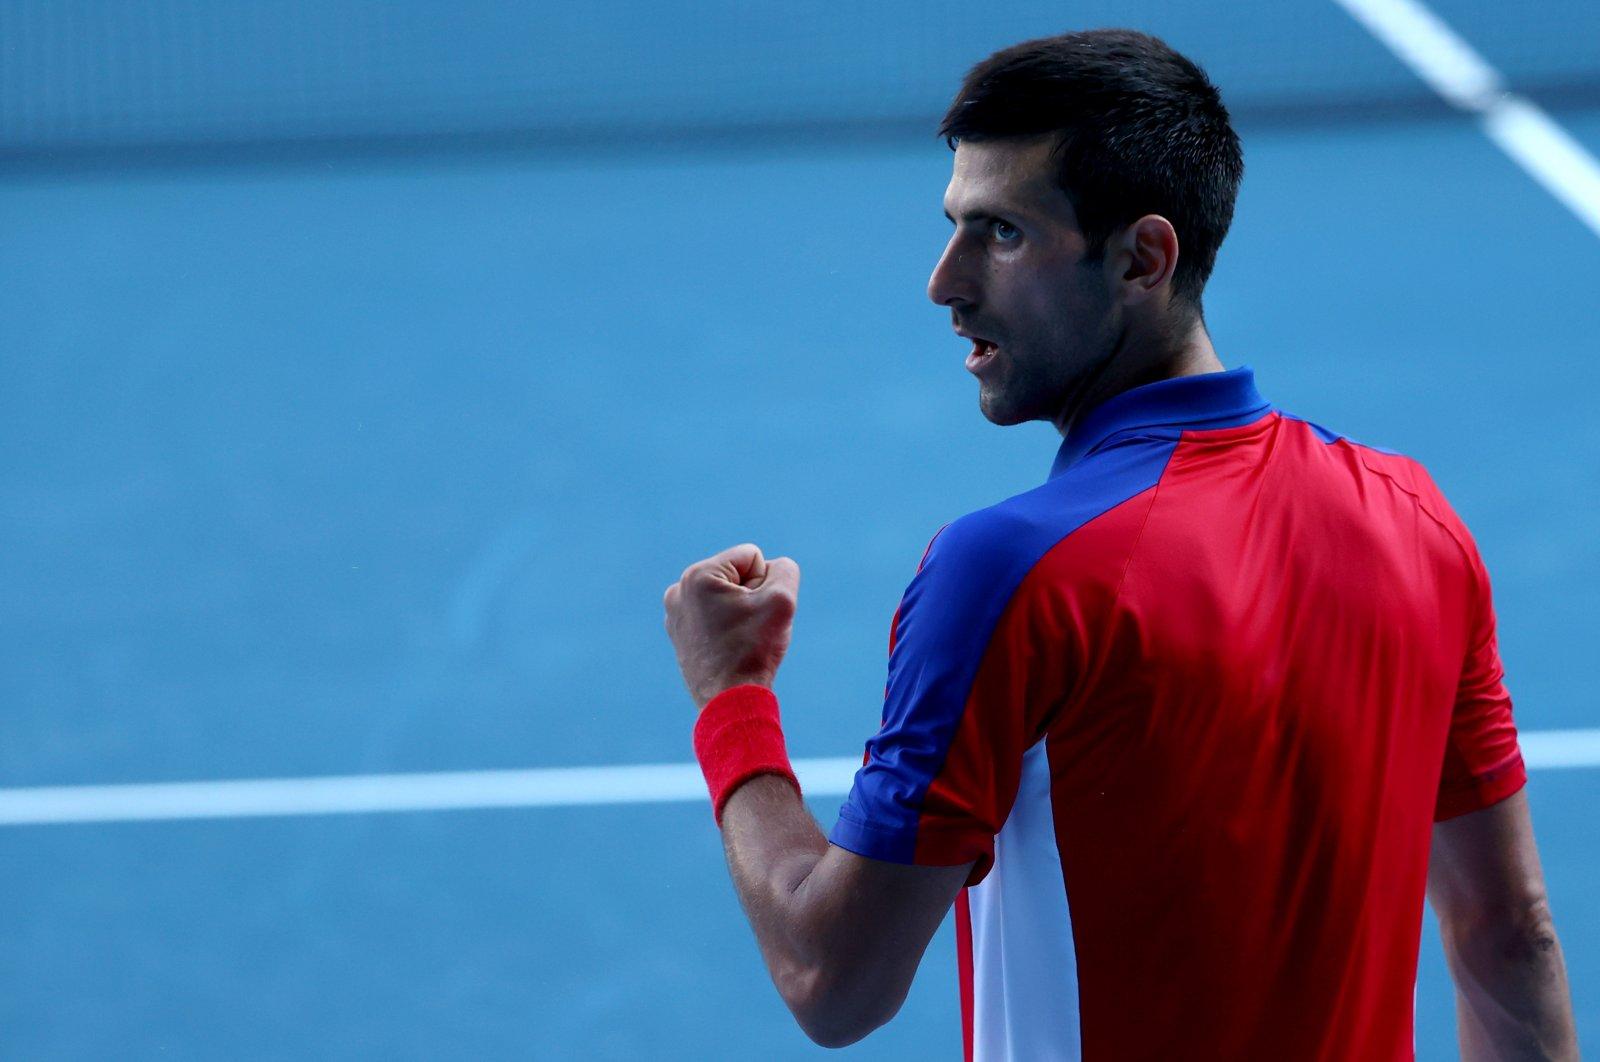 Serbia's Novak Djokovic reacts during his Tokyo 2020 bronze medal match against Spain's Pablo Carreno at the Ariake Tennis Park, Tokyo, Japan, July 31, 2021. (Reuters Photo)